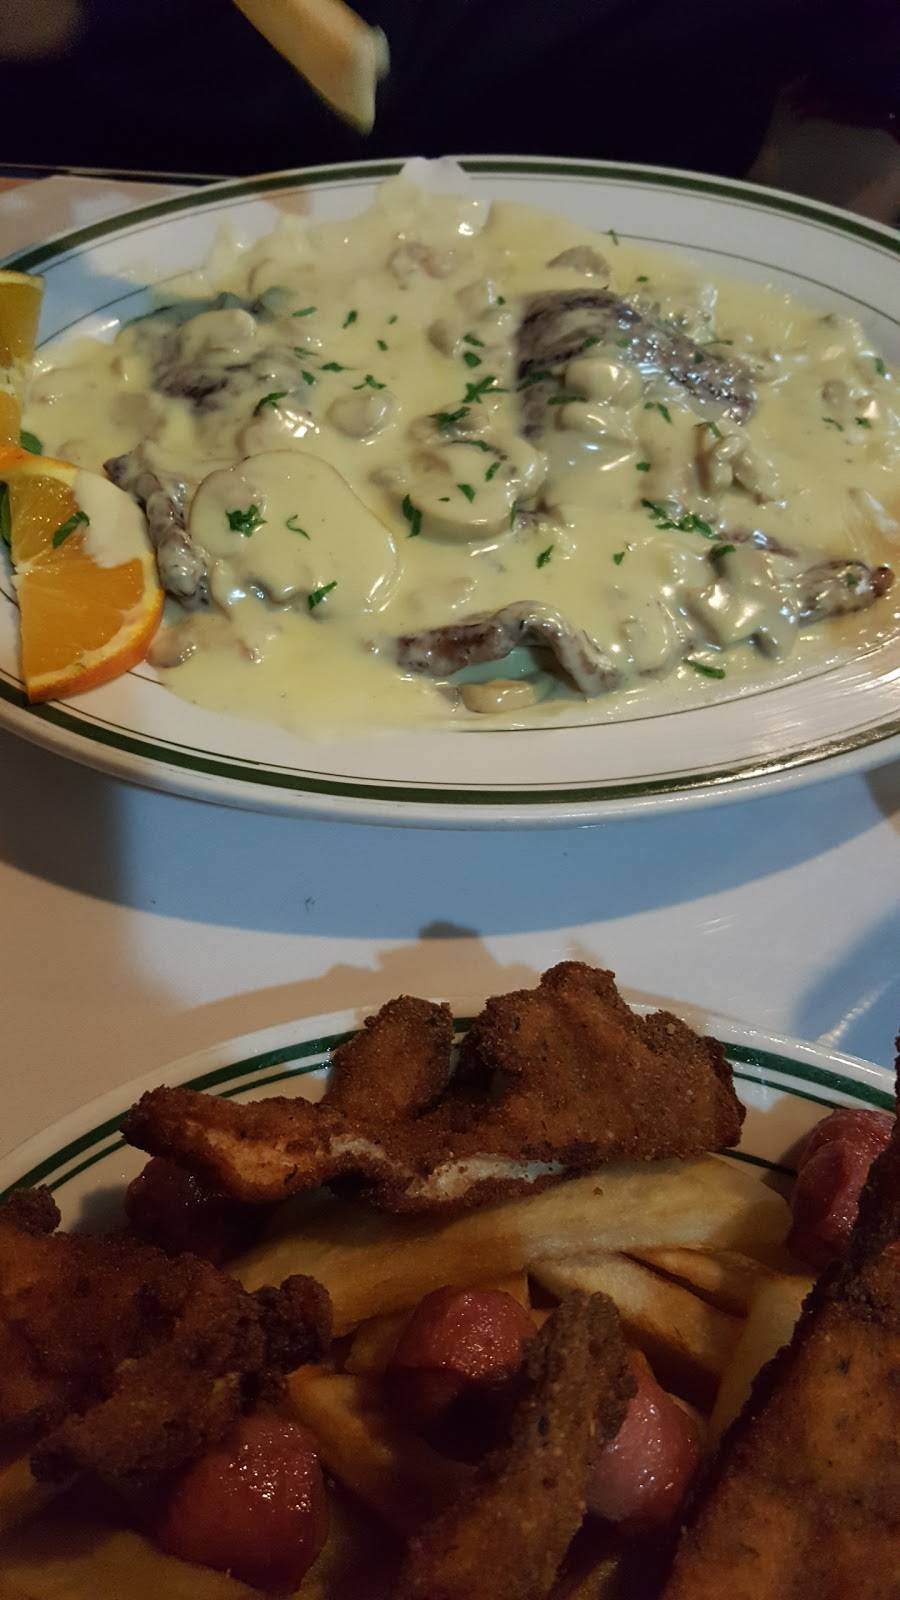 Subway Restaurants | restaurant | 87-08 Astoria Blvd, East Elmhurst, NY 11369, USA | 7182052568 OR +1 718-205-2568